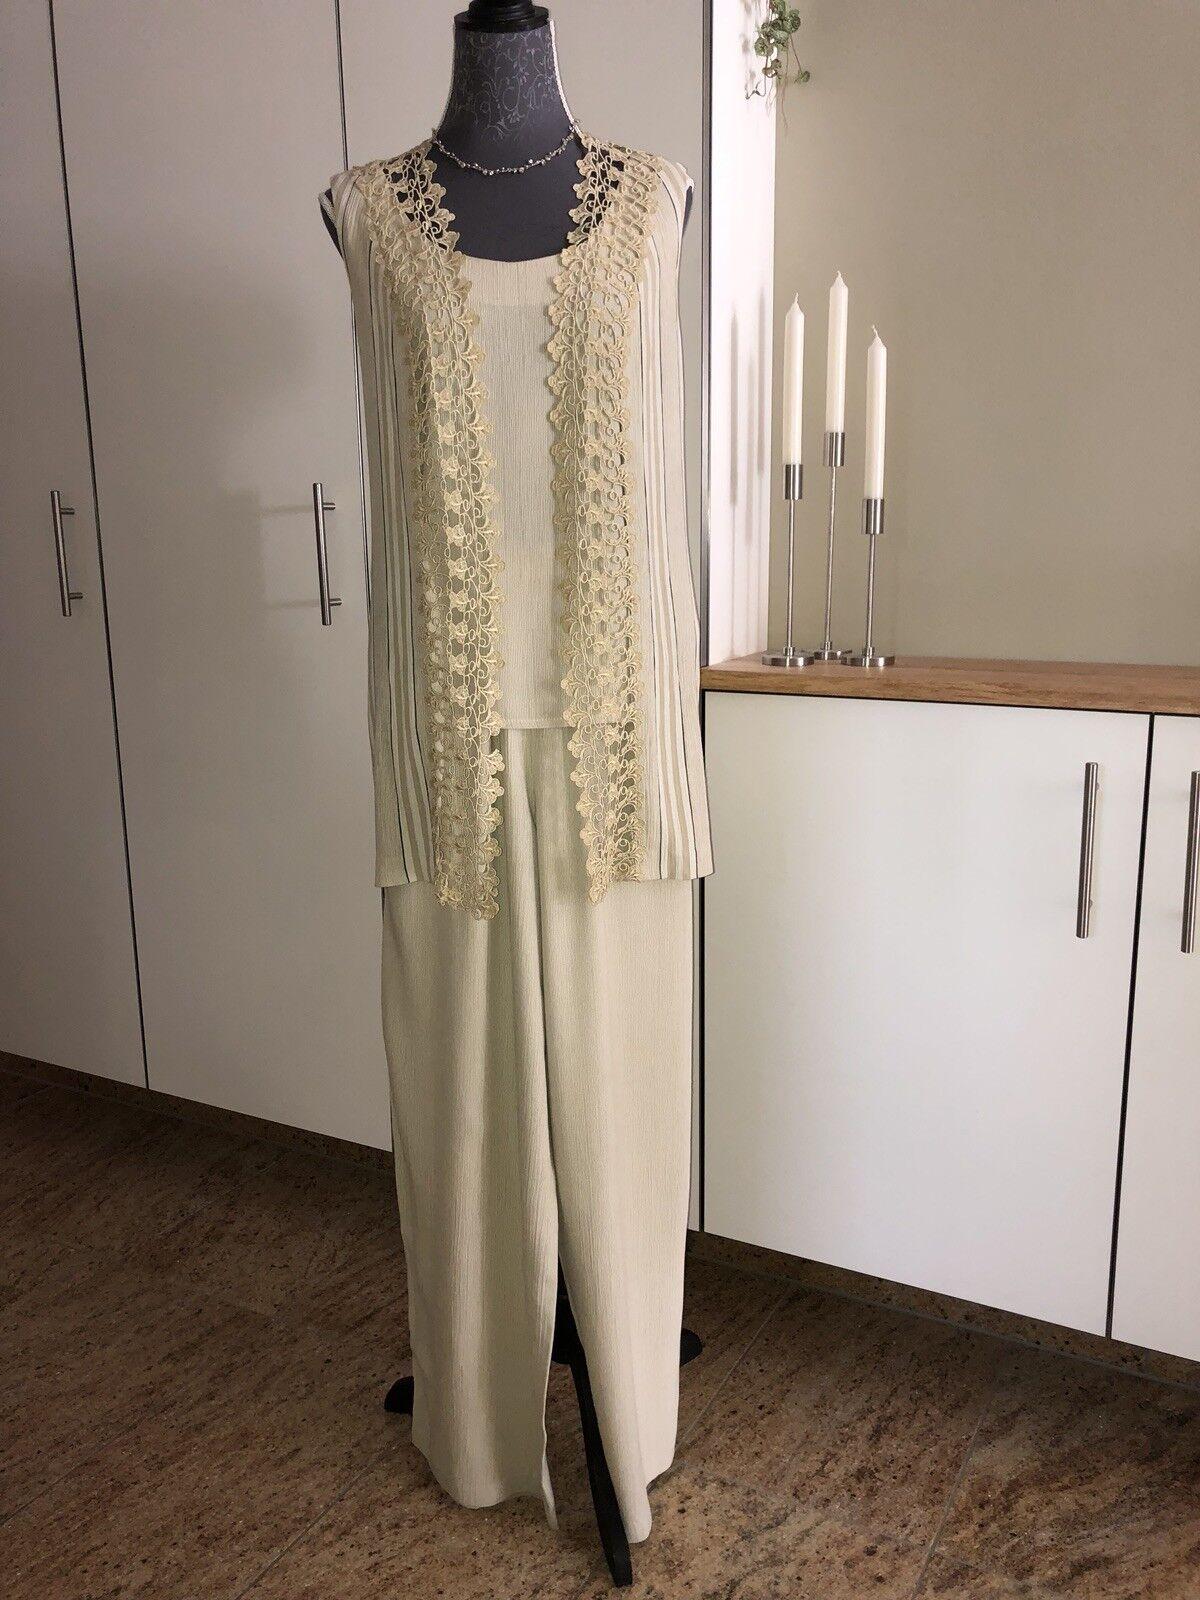 Joseph Ribkoff Designer Sommer-Kostüm Twinset + Hose 38 S M Luxus Couture